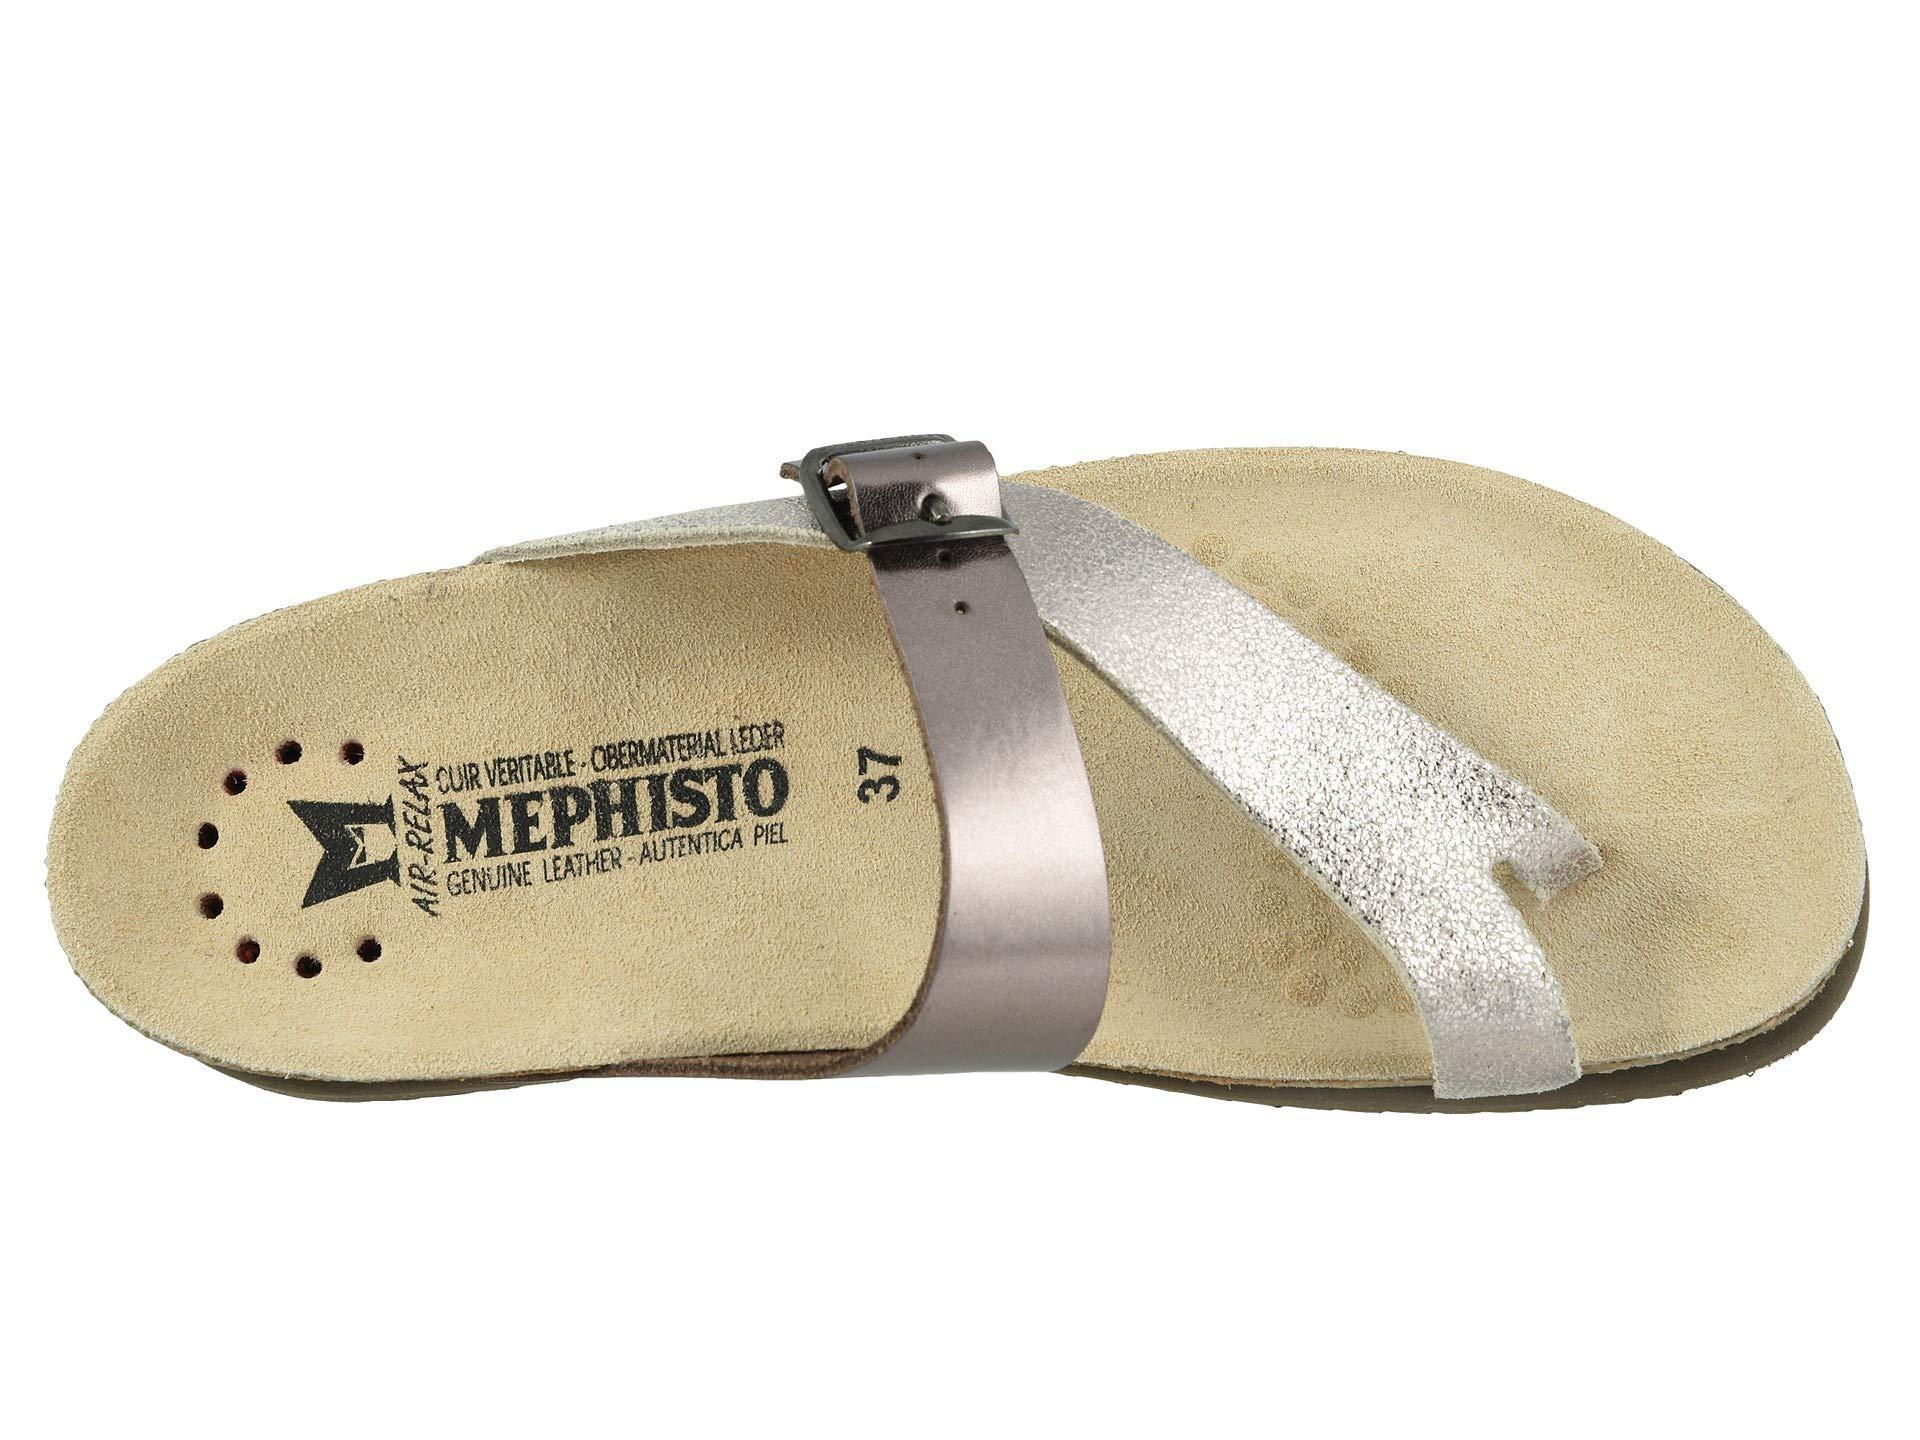 ef34d40f14 Lyst - Mephisto Helen Mix (black Waxy/cuba) Women's Sandals